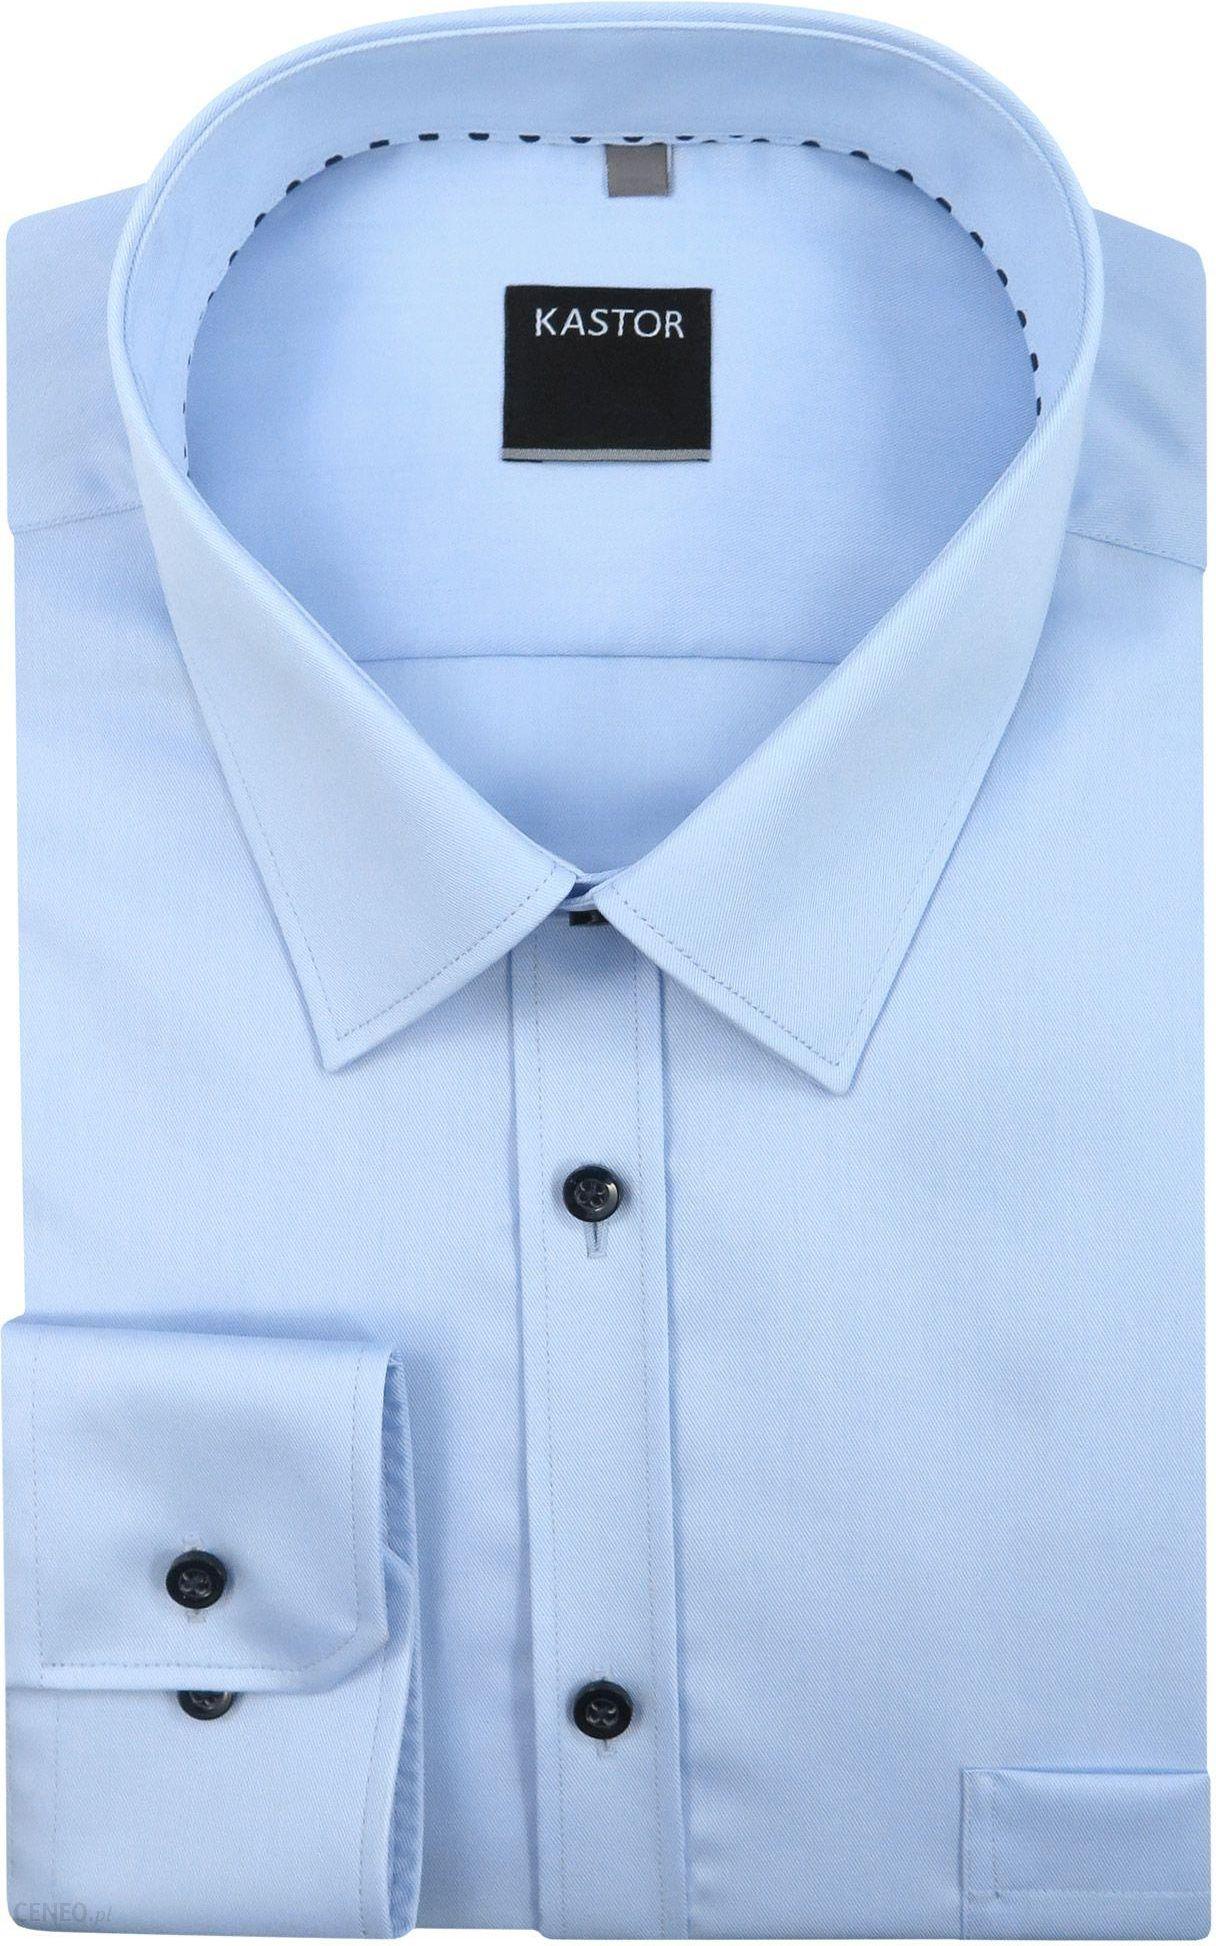 4c872df3aaecc7 Kastor - Koszule męskie Błękitna koszula męska z kieszonką K59 - zdjęcie 1